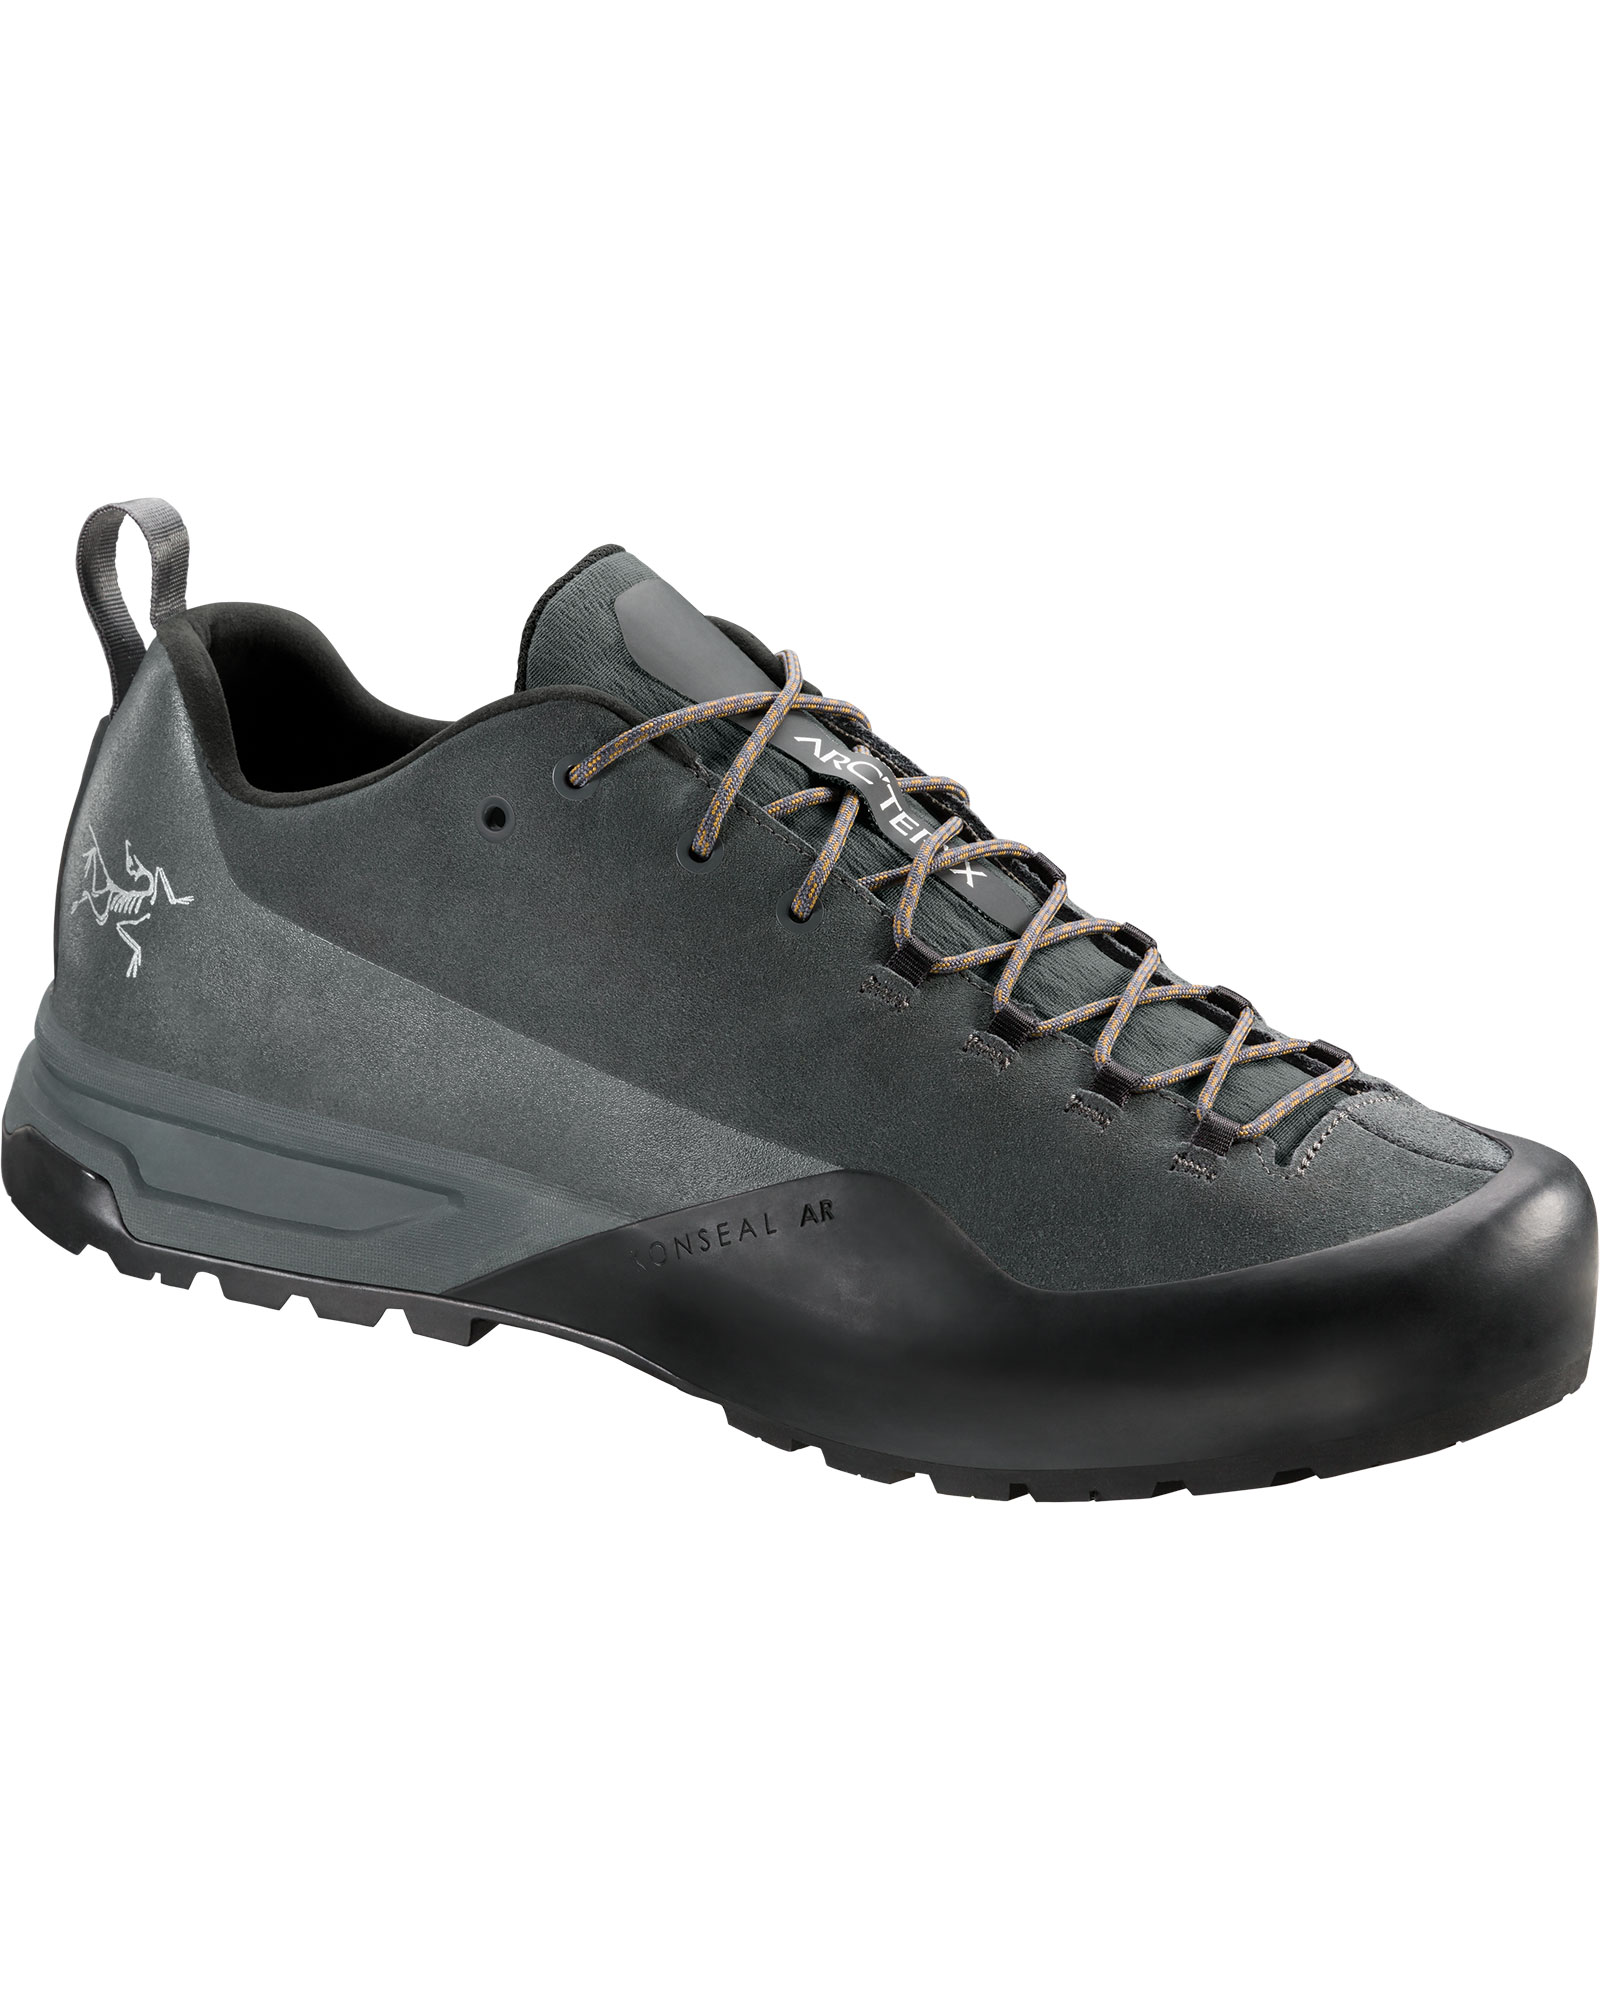 Arc'teryx Men's Konseal AR Shoes 0